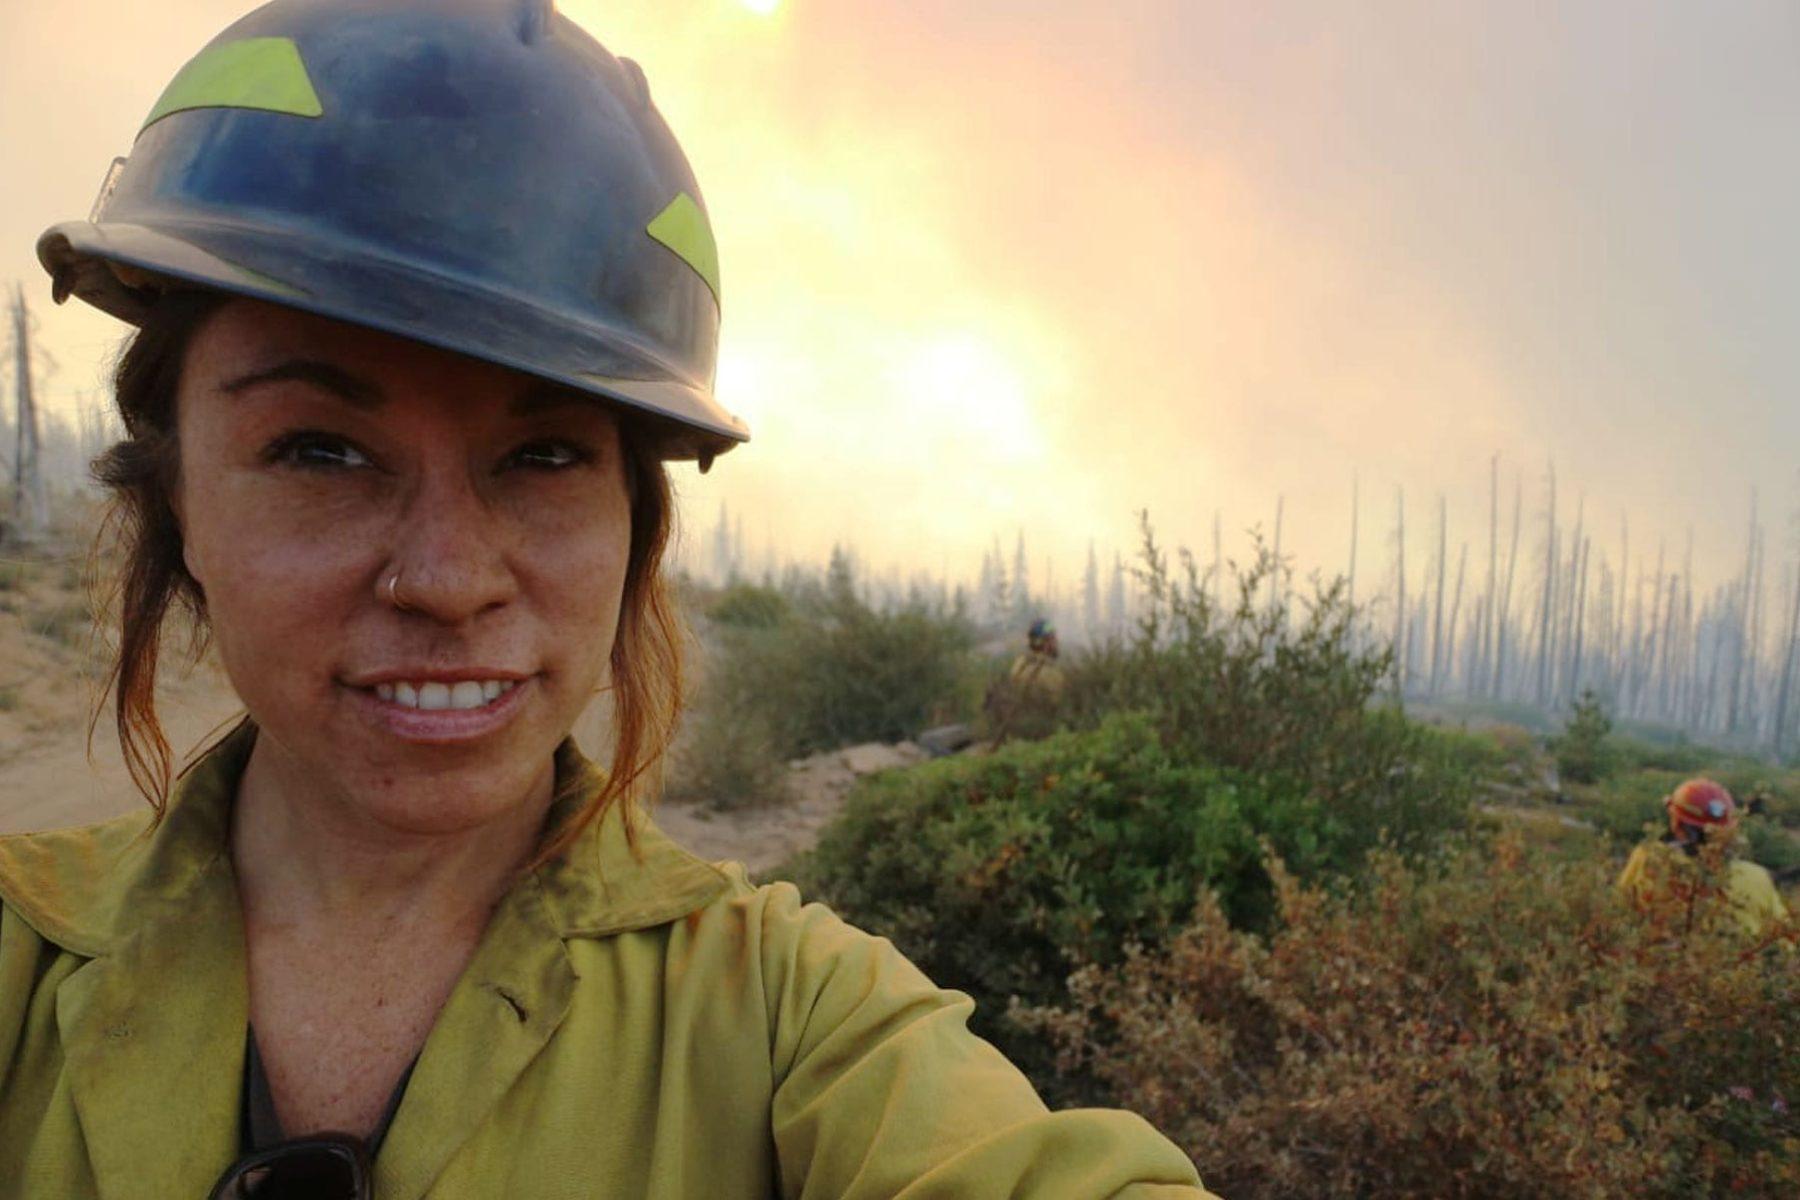 Eleonore Jordan Anderson takes a selfie in front of a landscape.